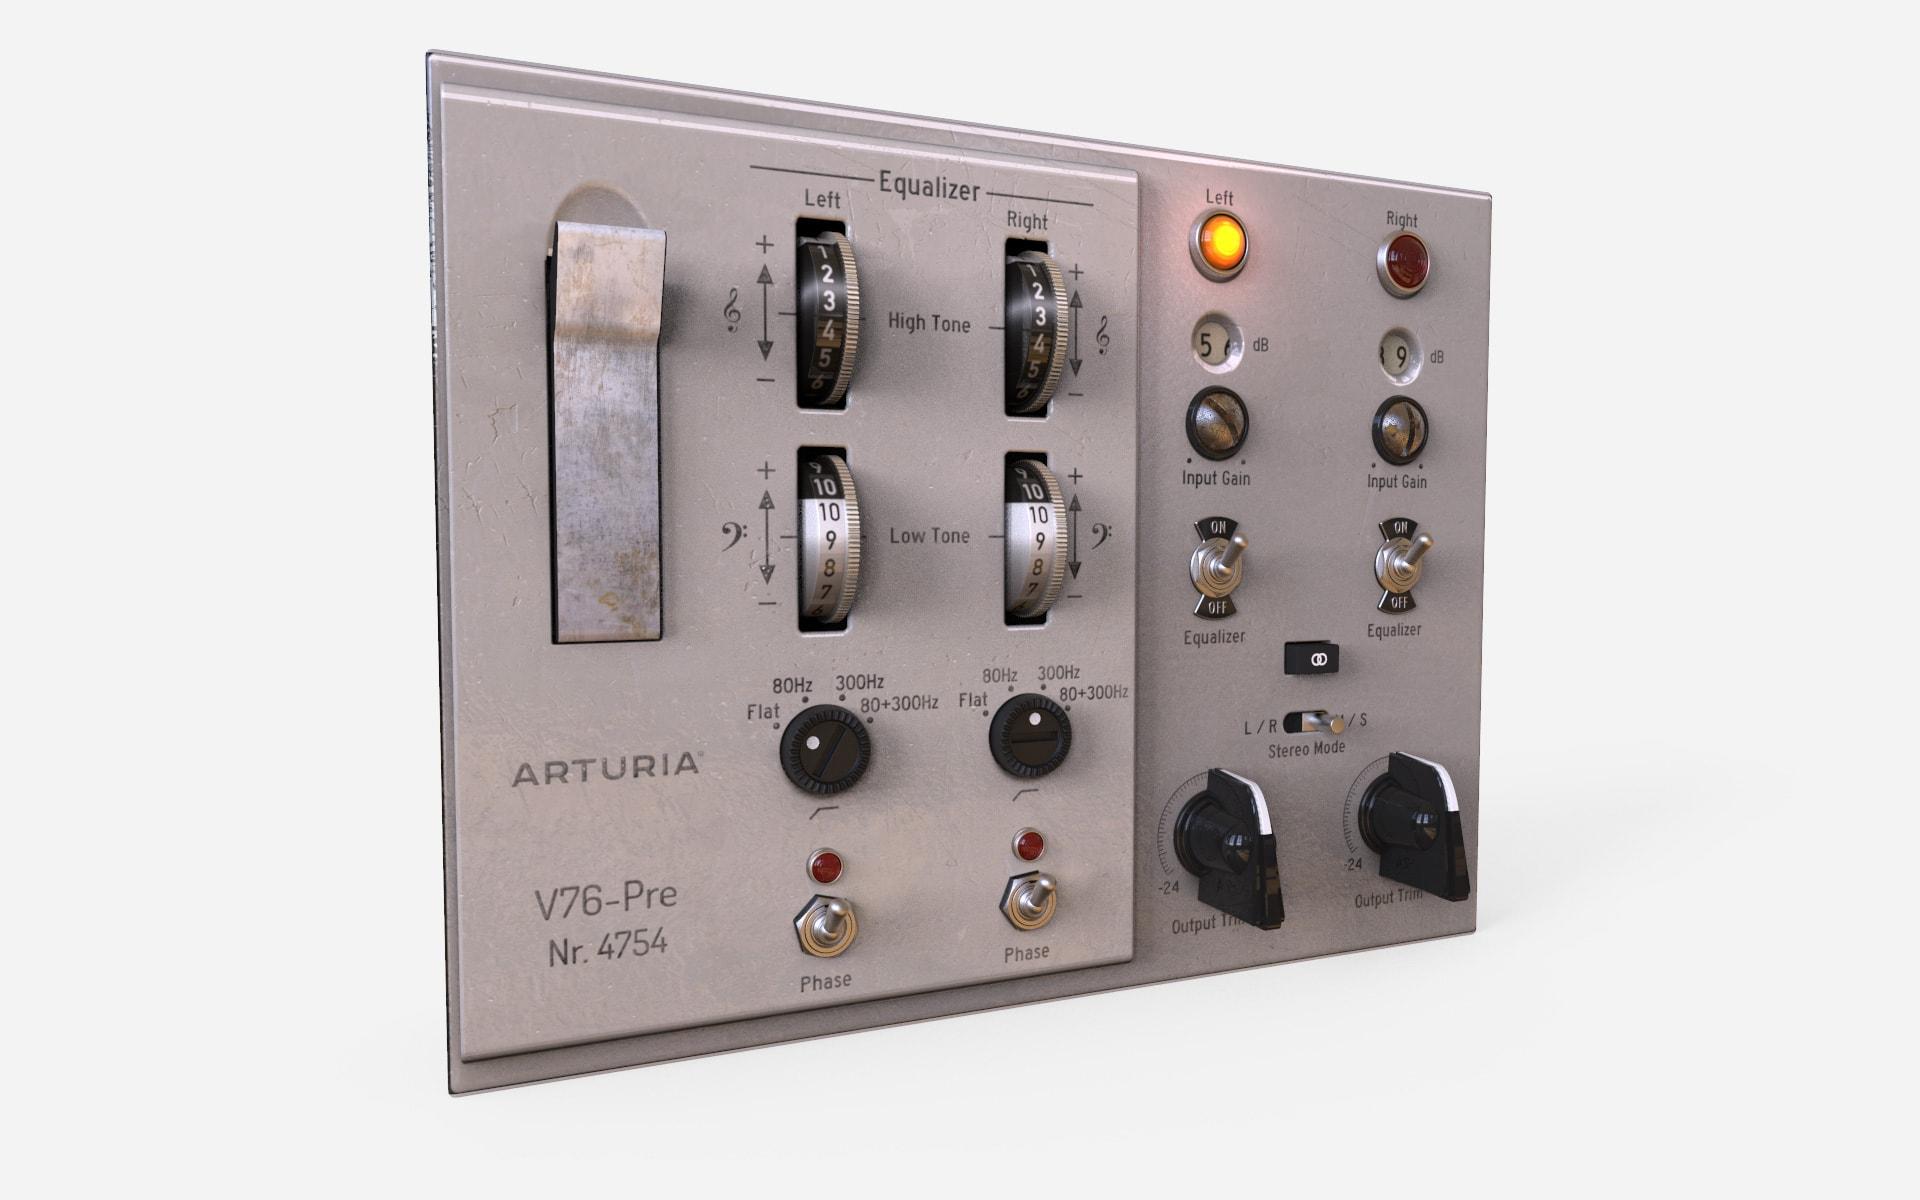 Arturia - V76-Pre